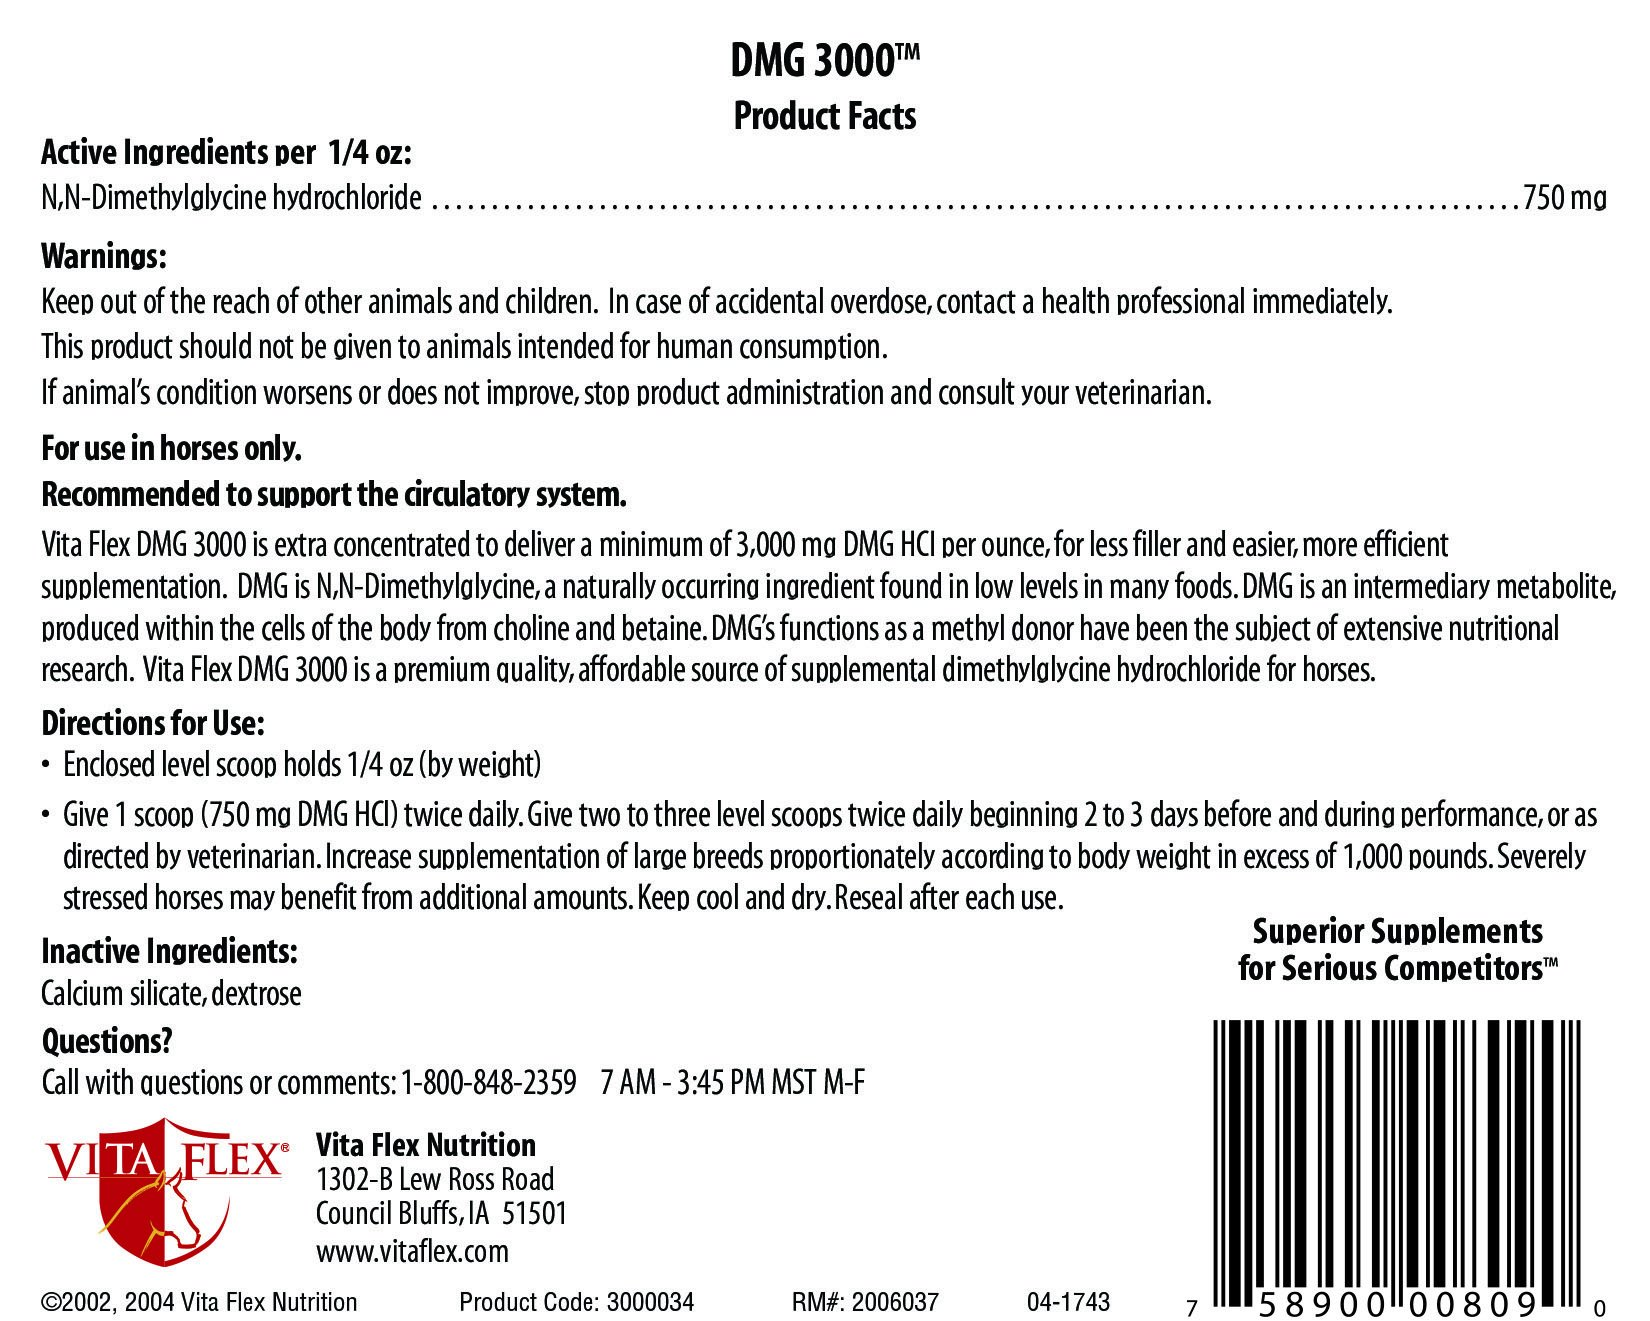 Vita Flex DMG 3000 Concentrate, 128 Day Supply, 4 lbs 3